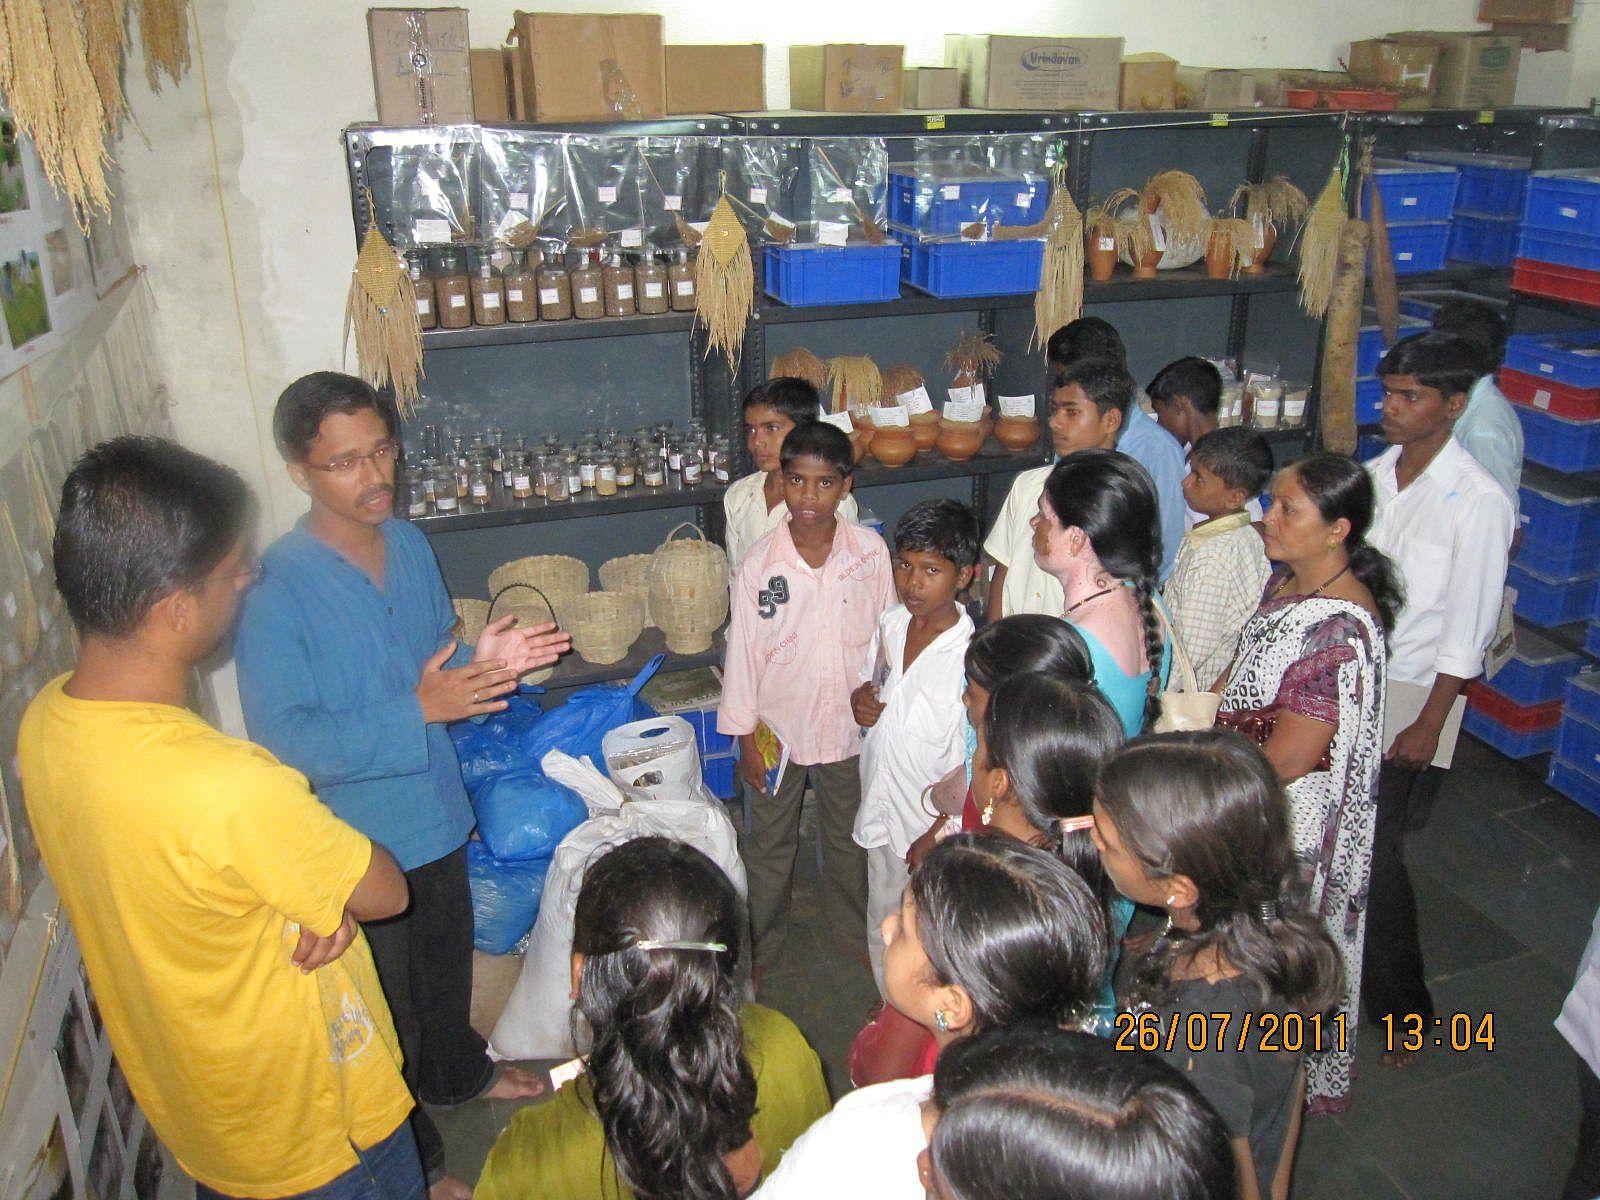 Saurabh Poddar with a group of students at Jawhar.